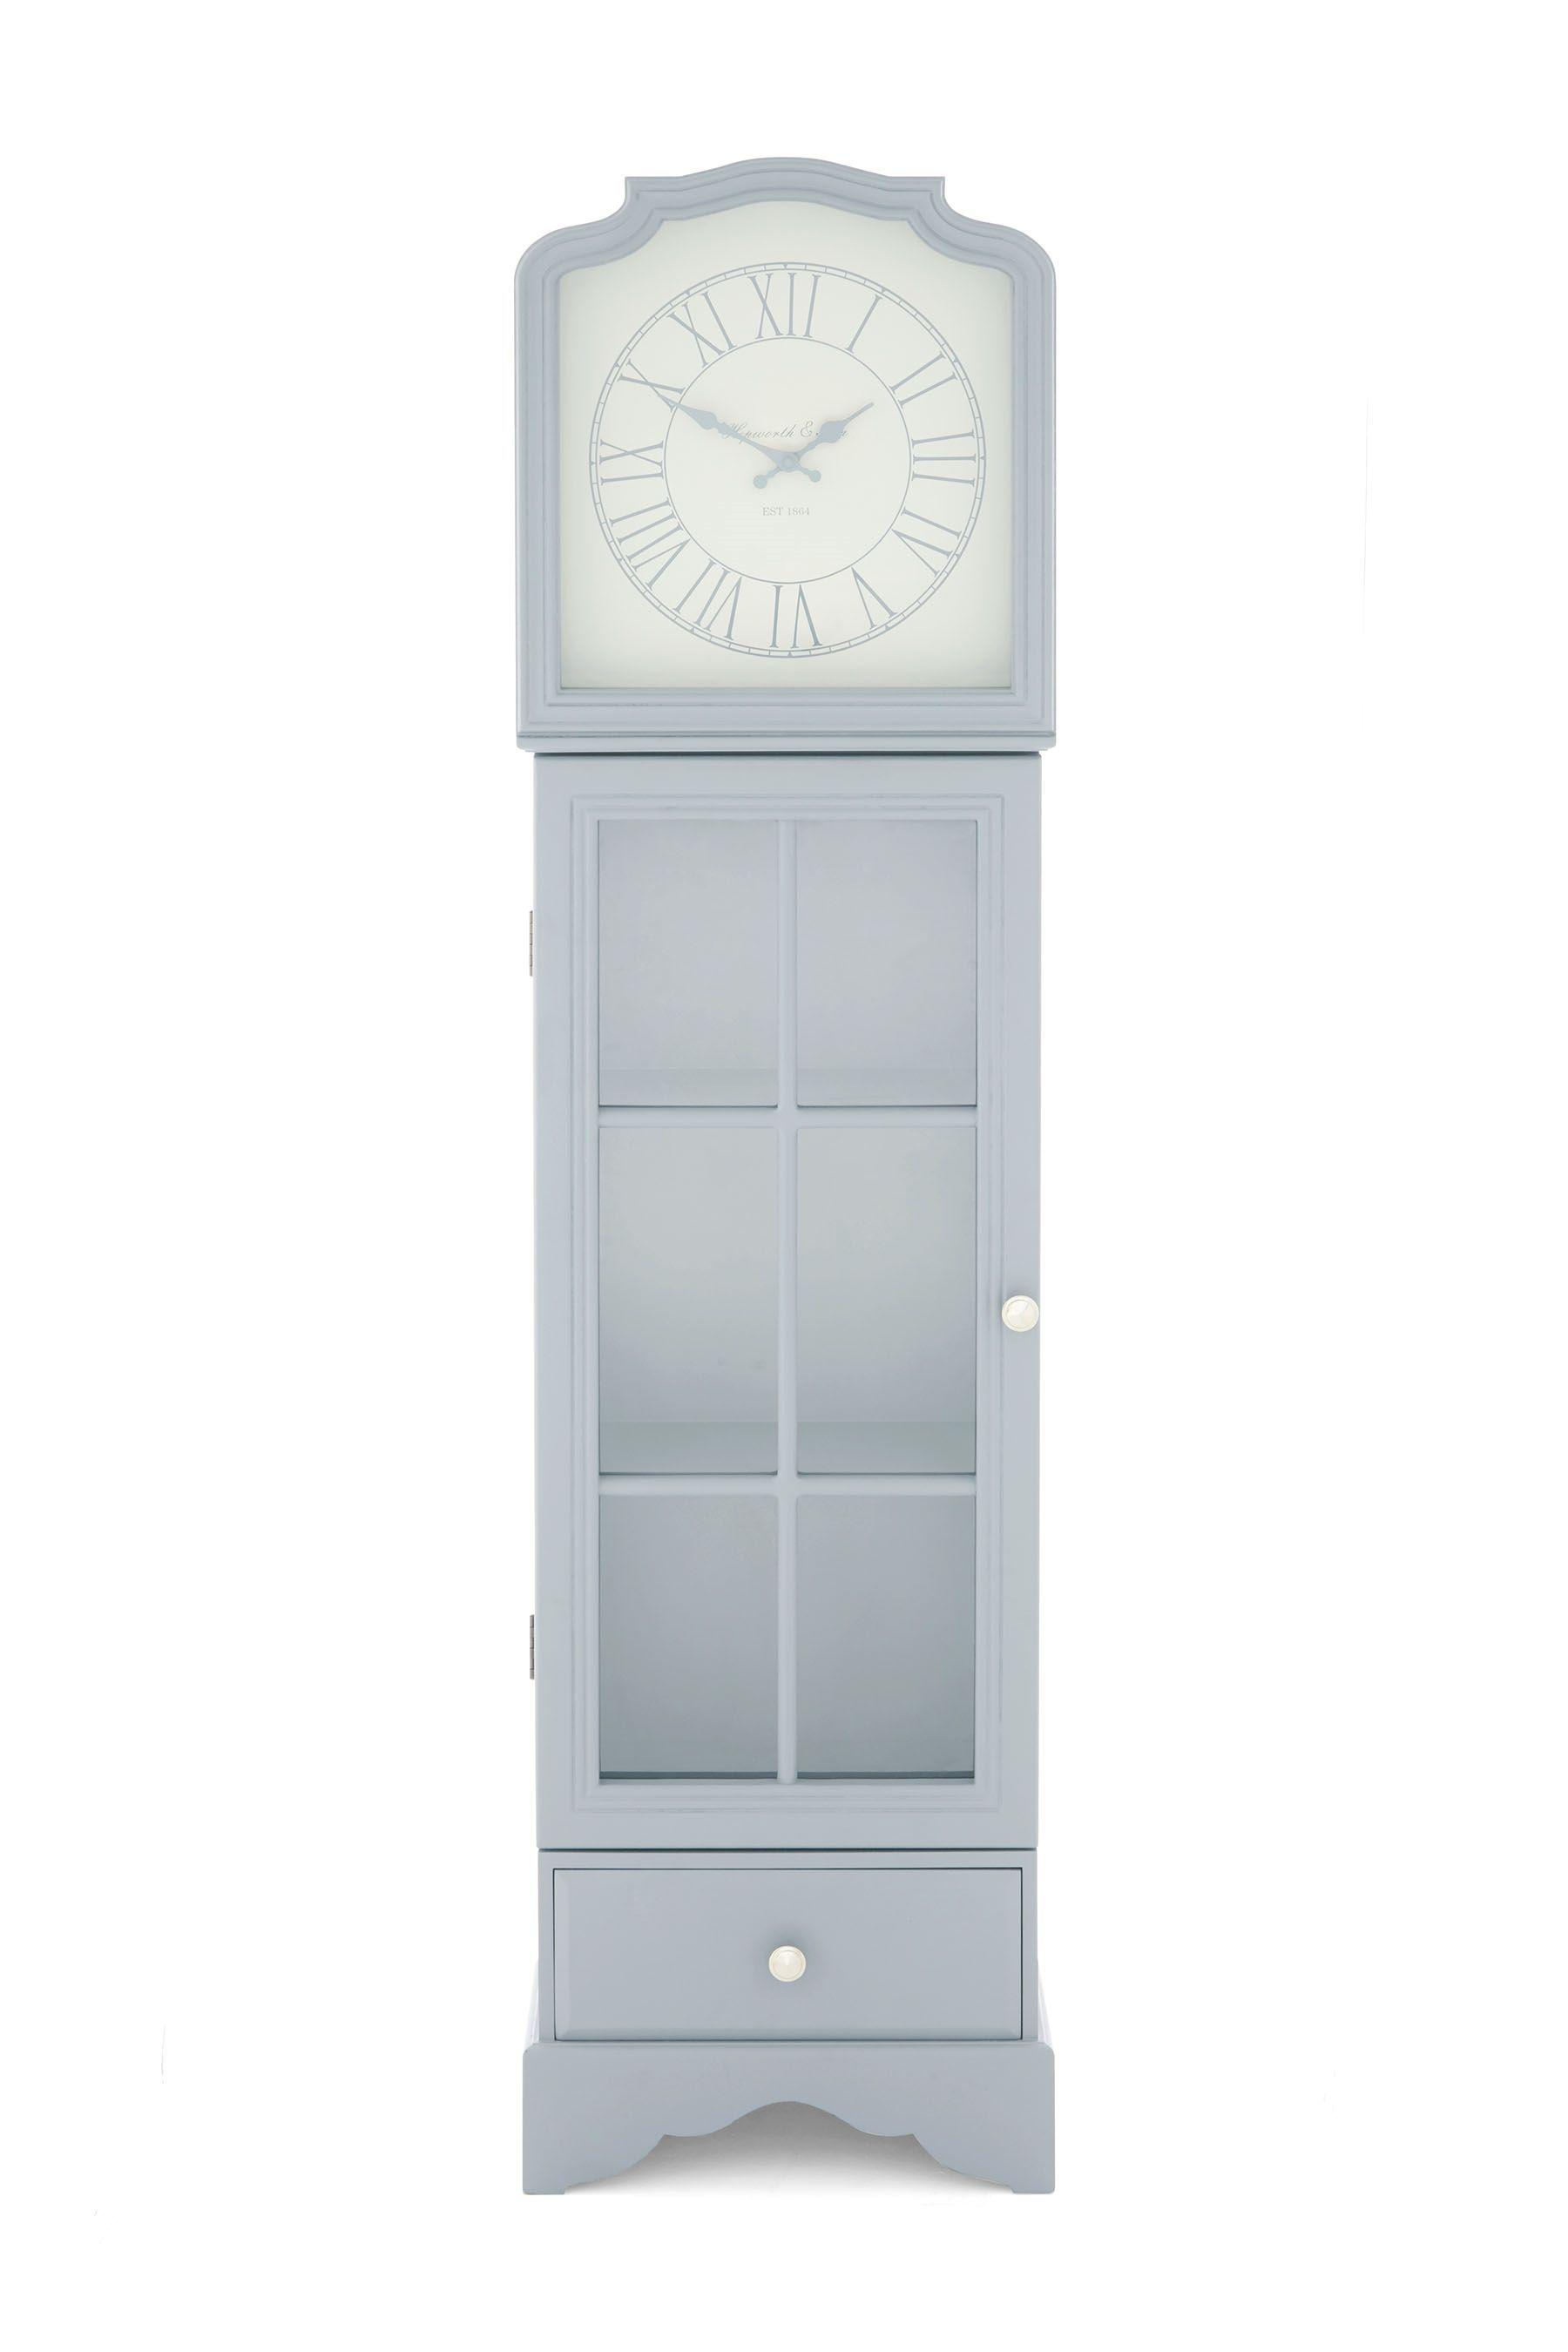 Buy Wooden Grandmother Clock From The Next UK Online Shop